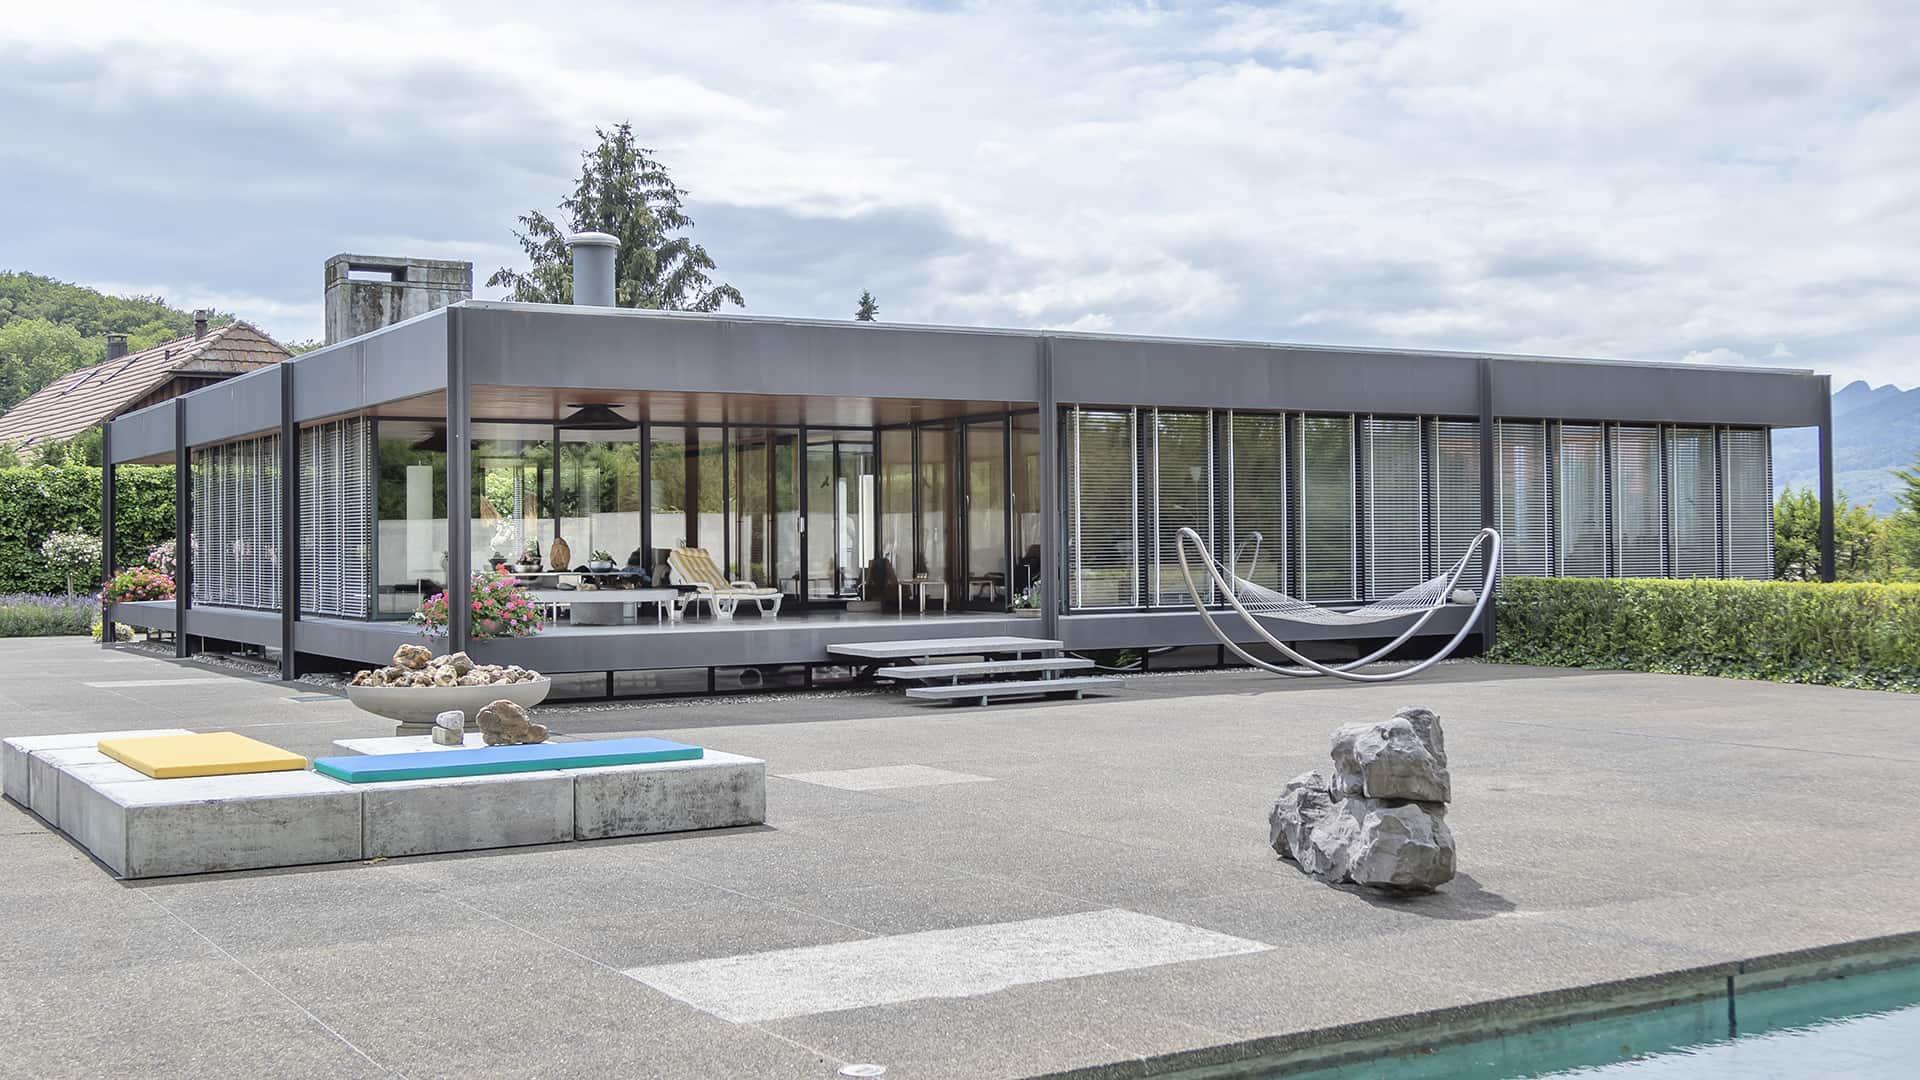 belle-maison-a-vendre-starrkirch-wil-cheminee-double-garage-piscine